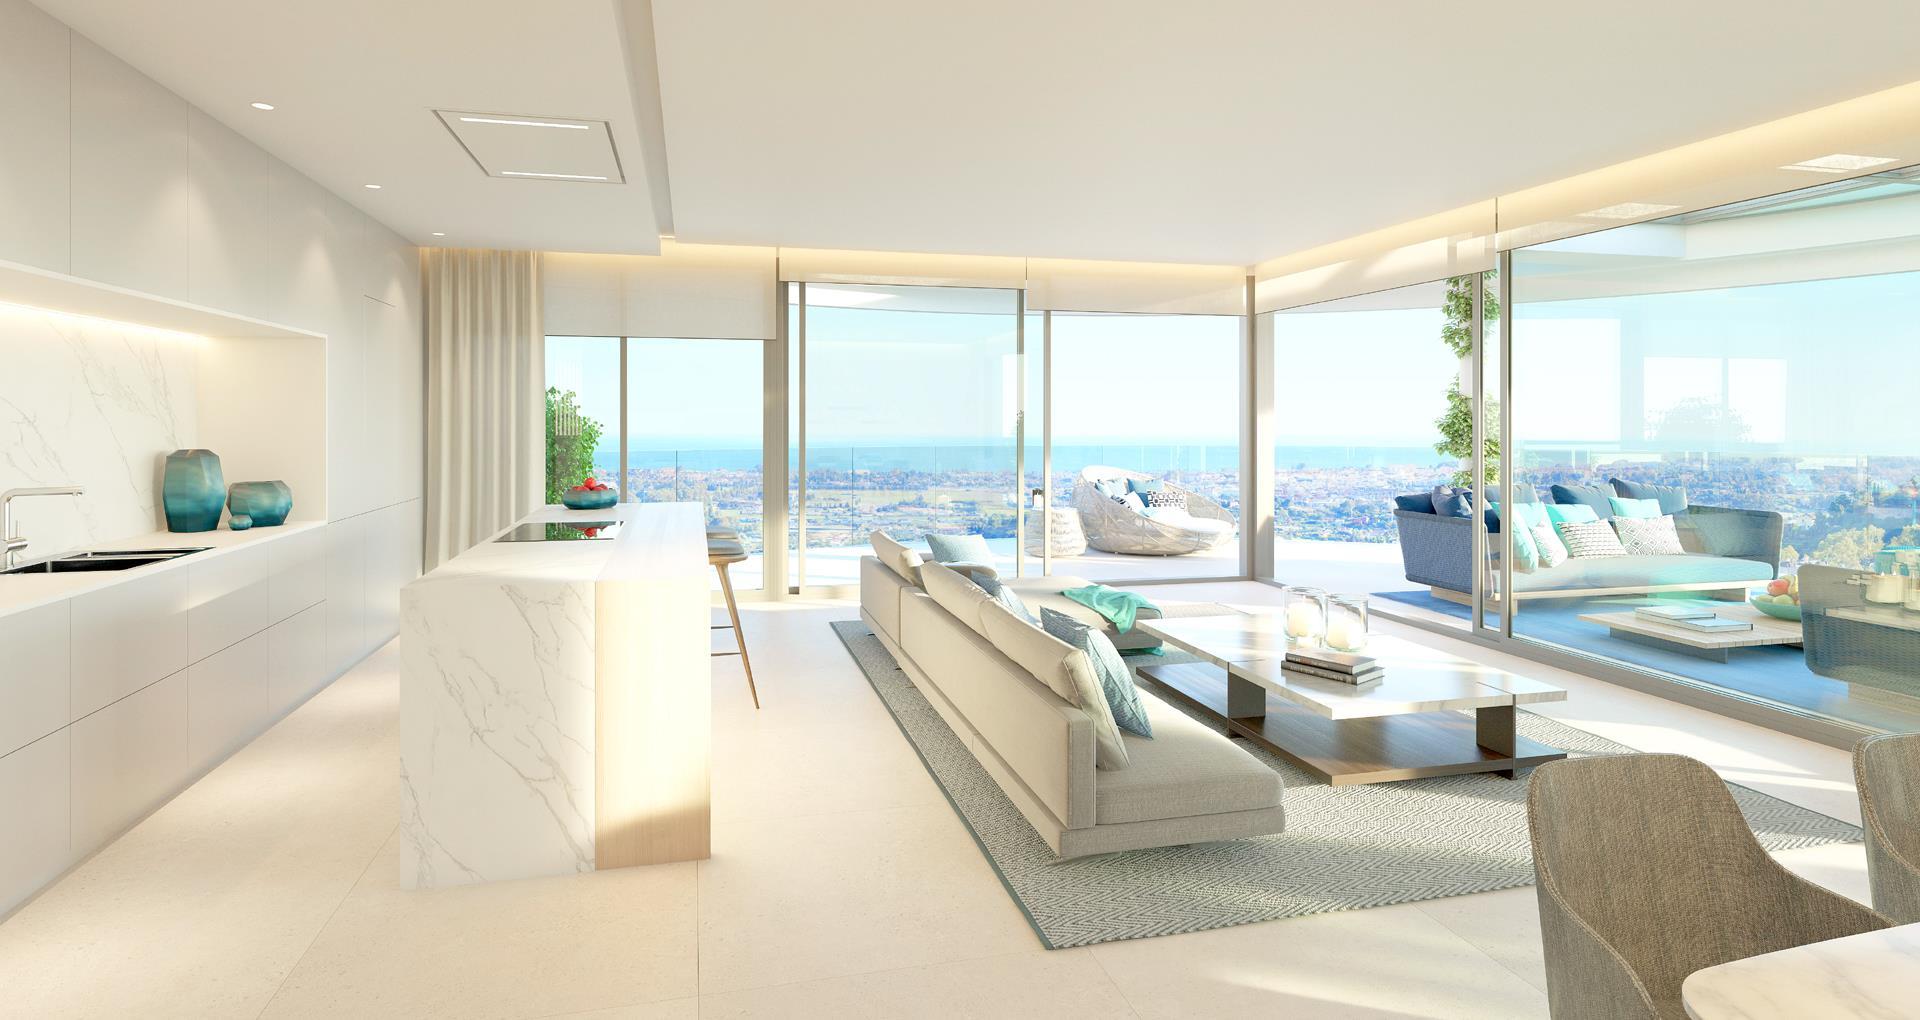 Apartments for sale in La Quinta (Marbella) MCO3361894